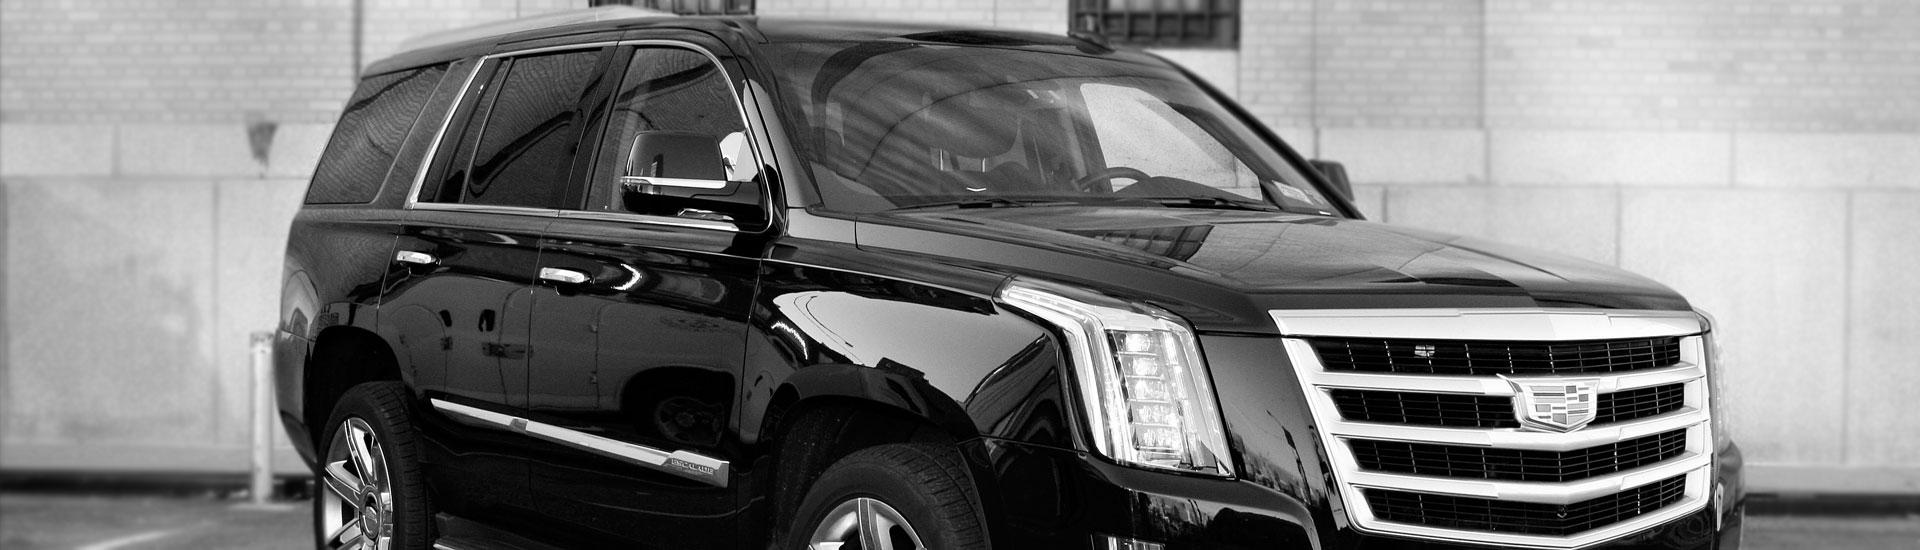 Cadillac escalade window tint